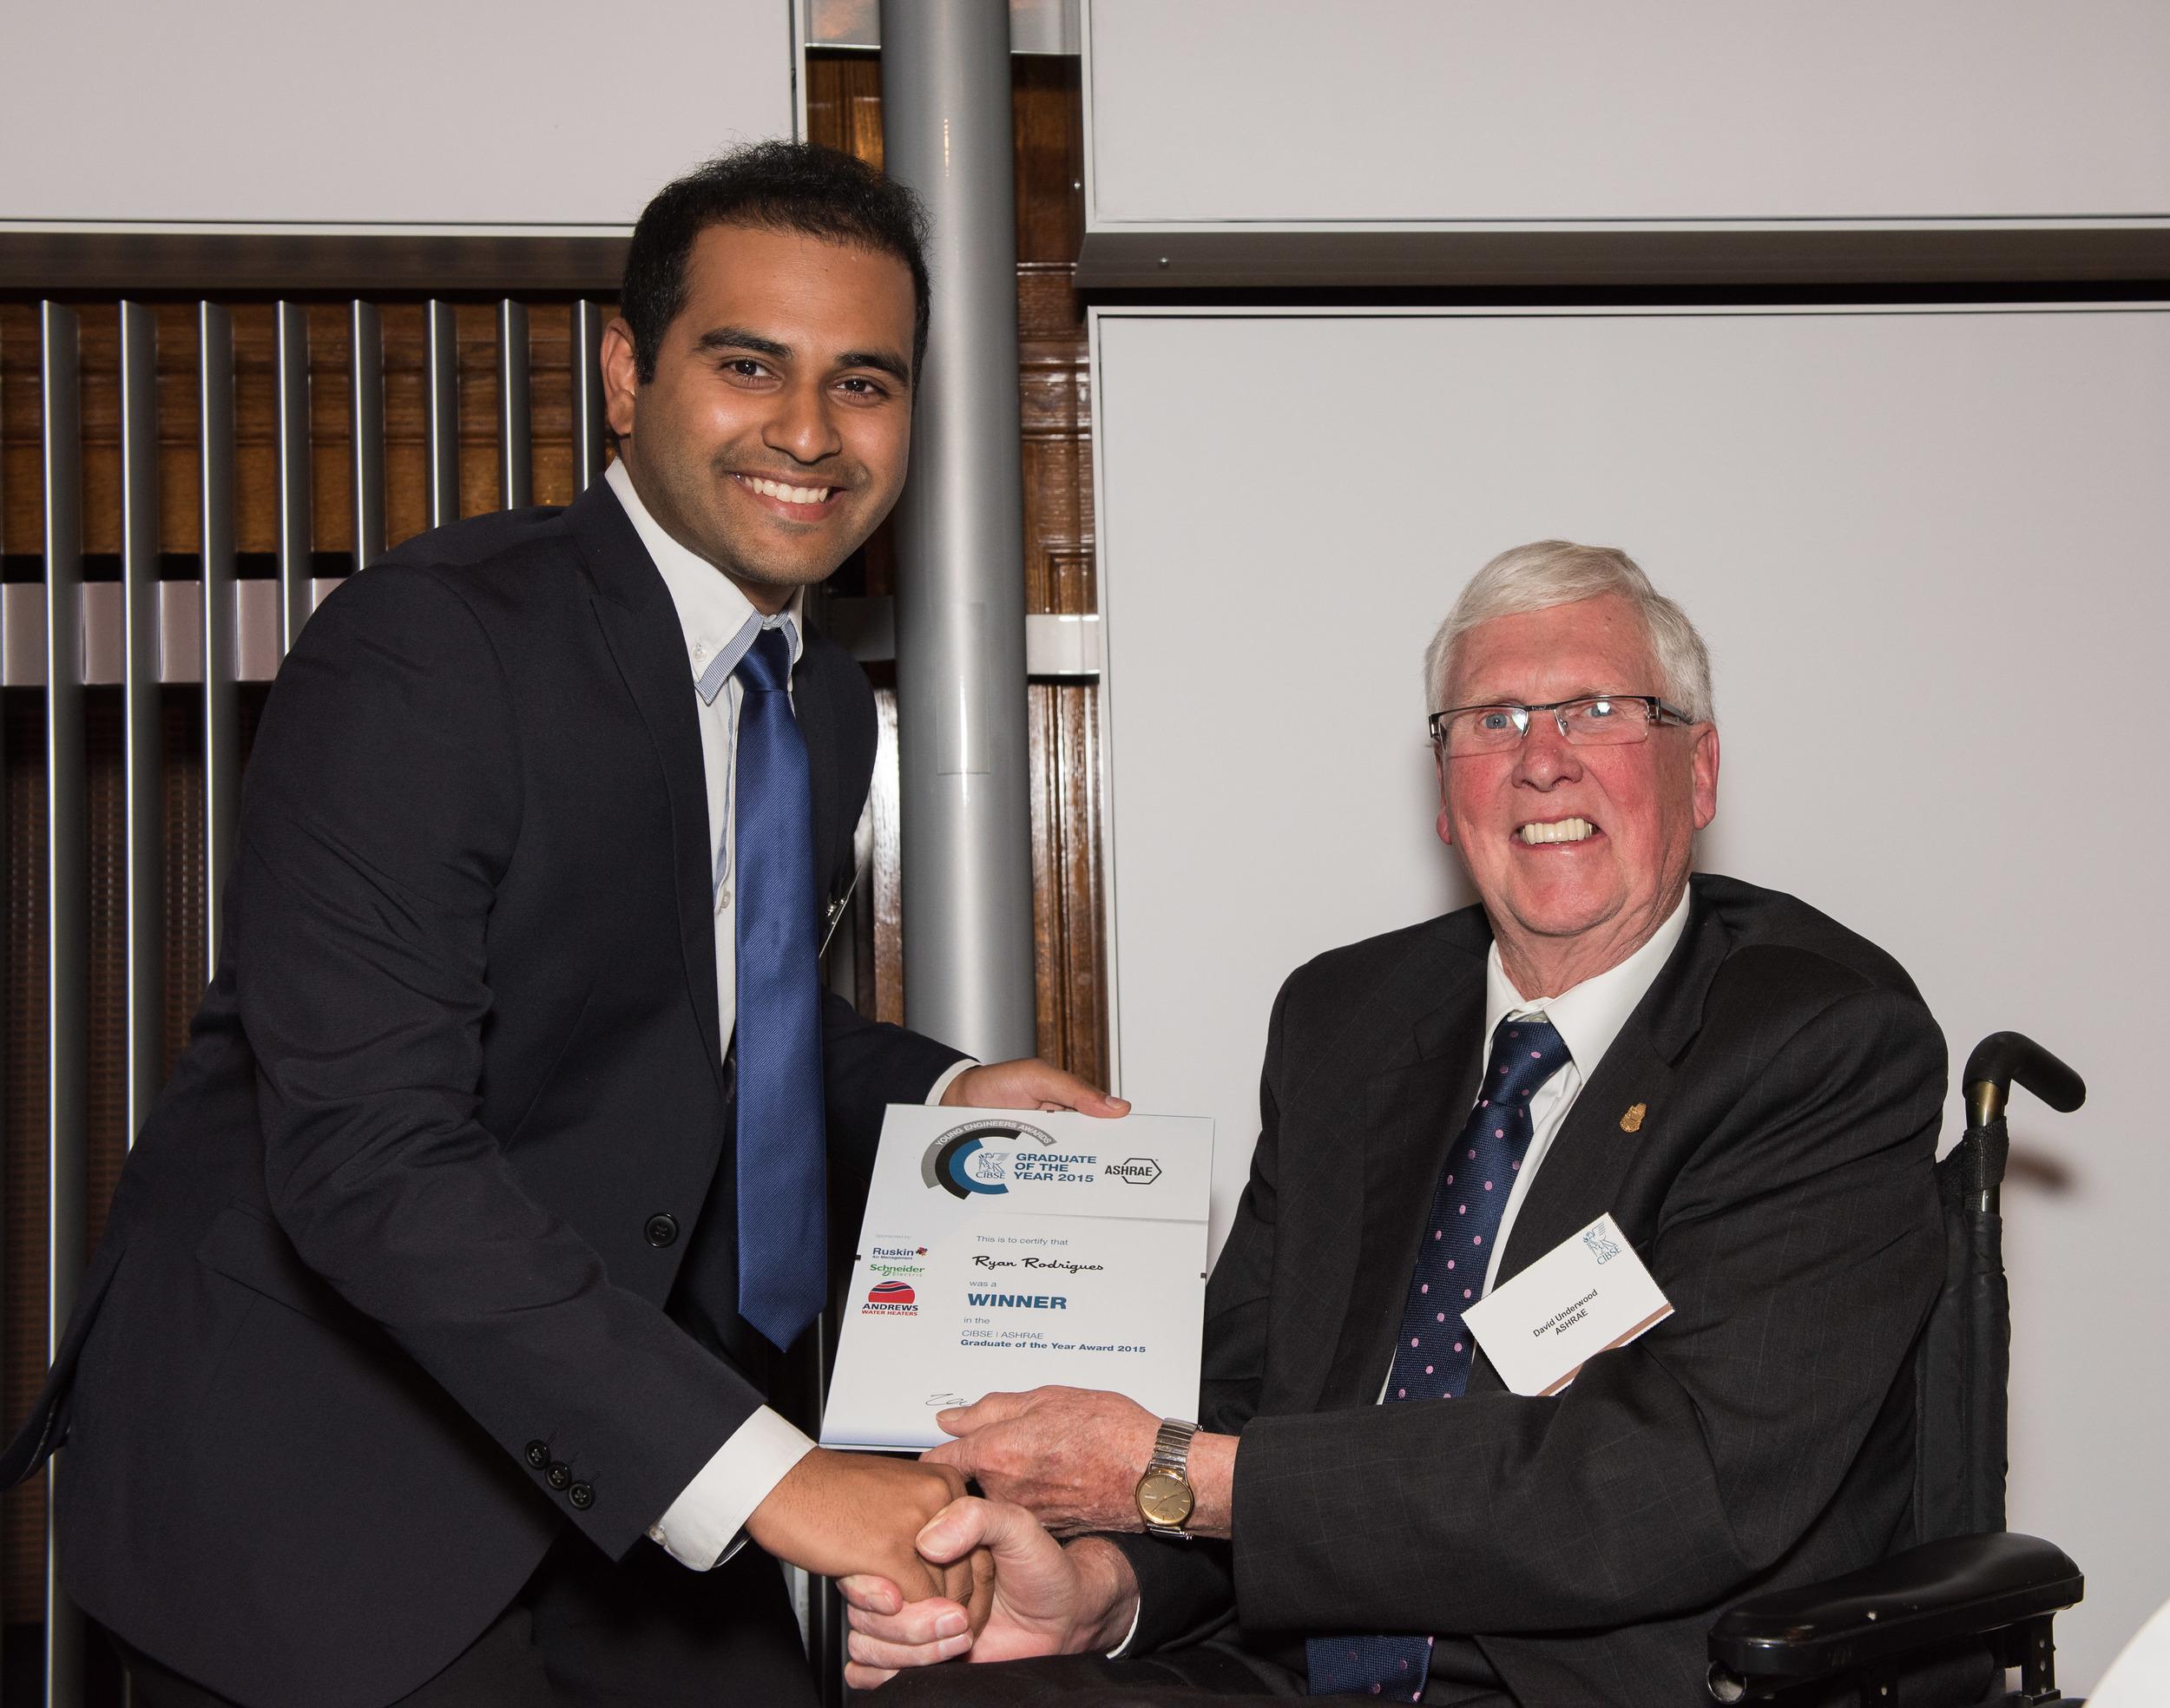 Ryan Rodrigues receives award from ASHRAE president.